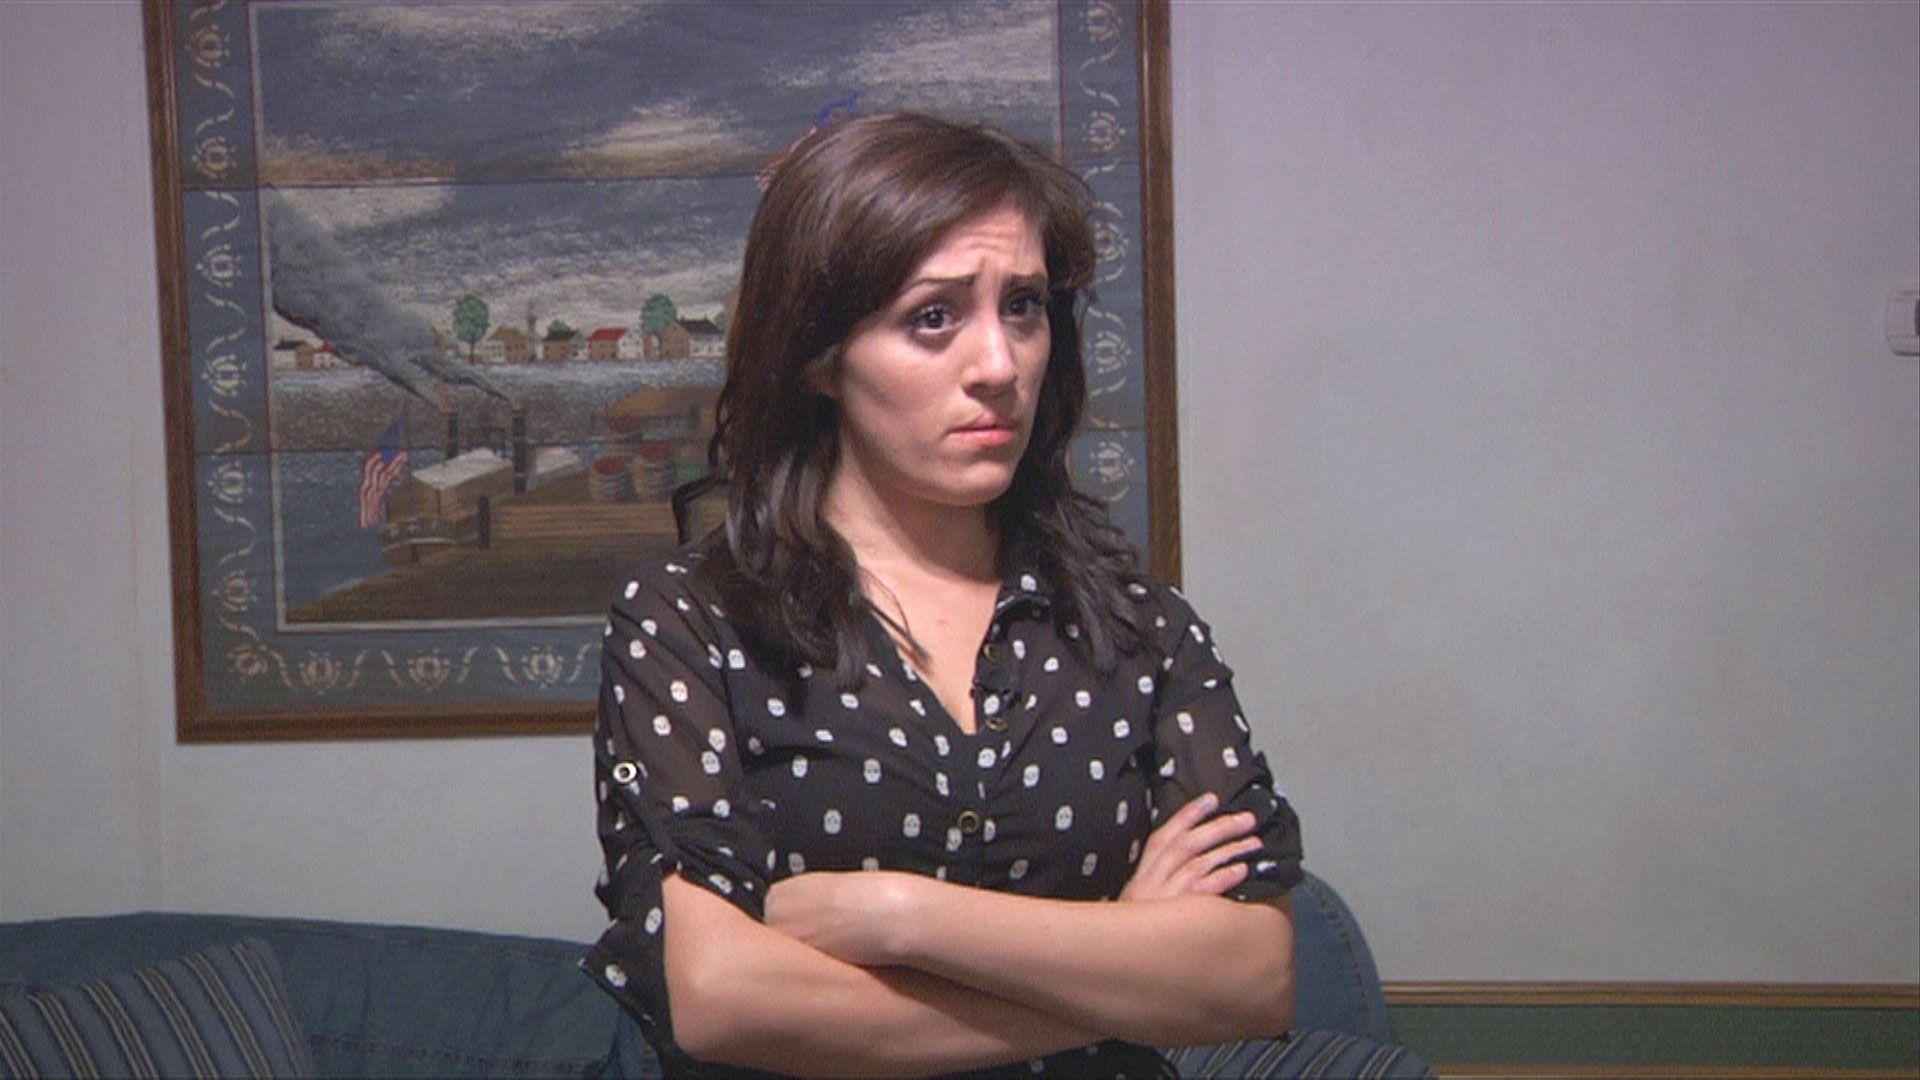 True Life - Season 8, Episode 1: I'm Jealous - TV.com